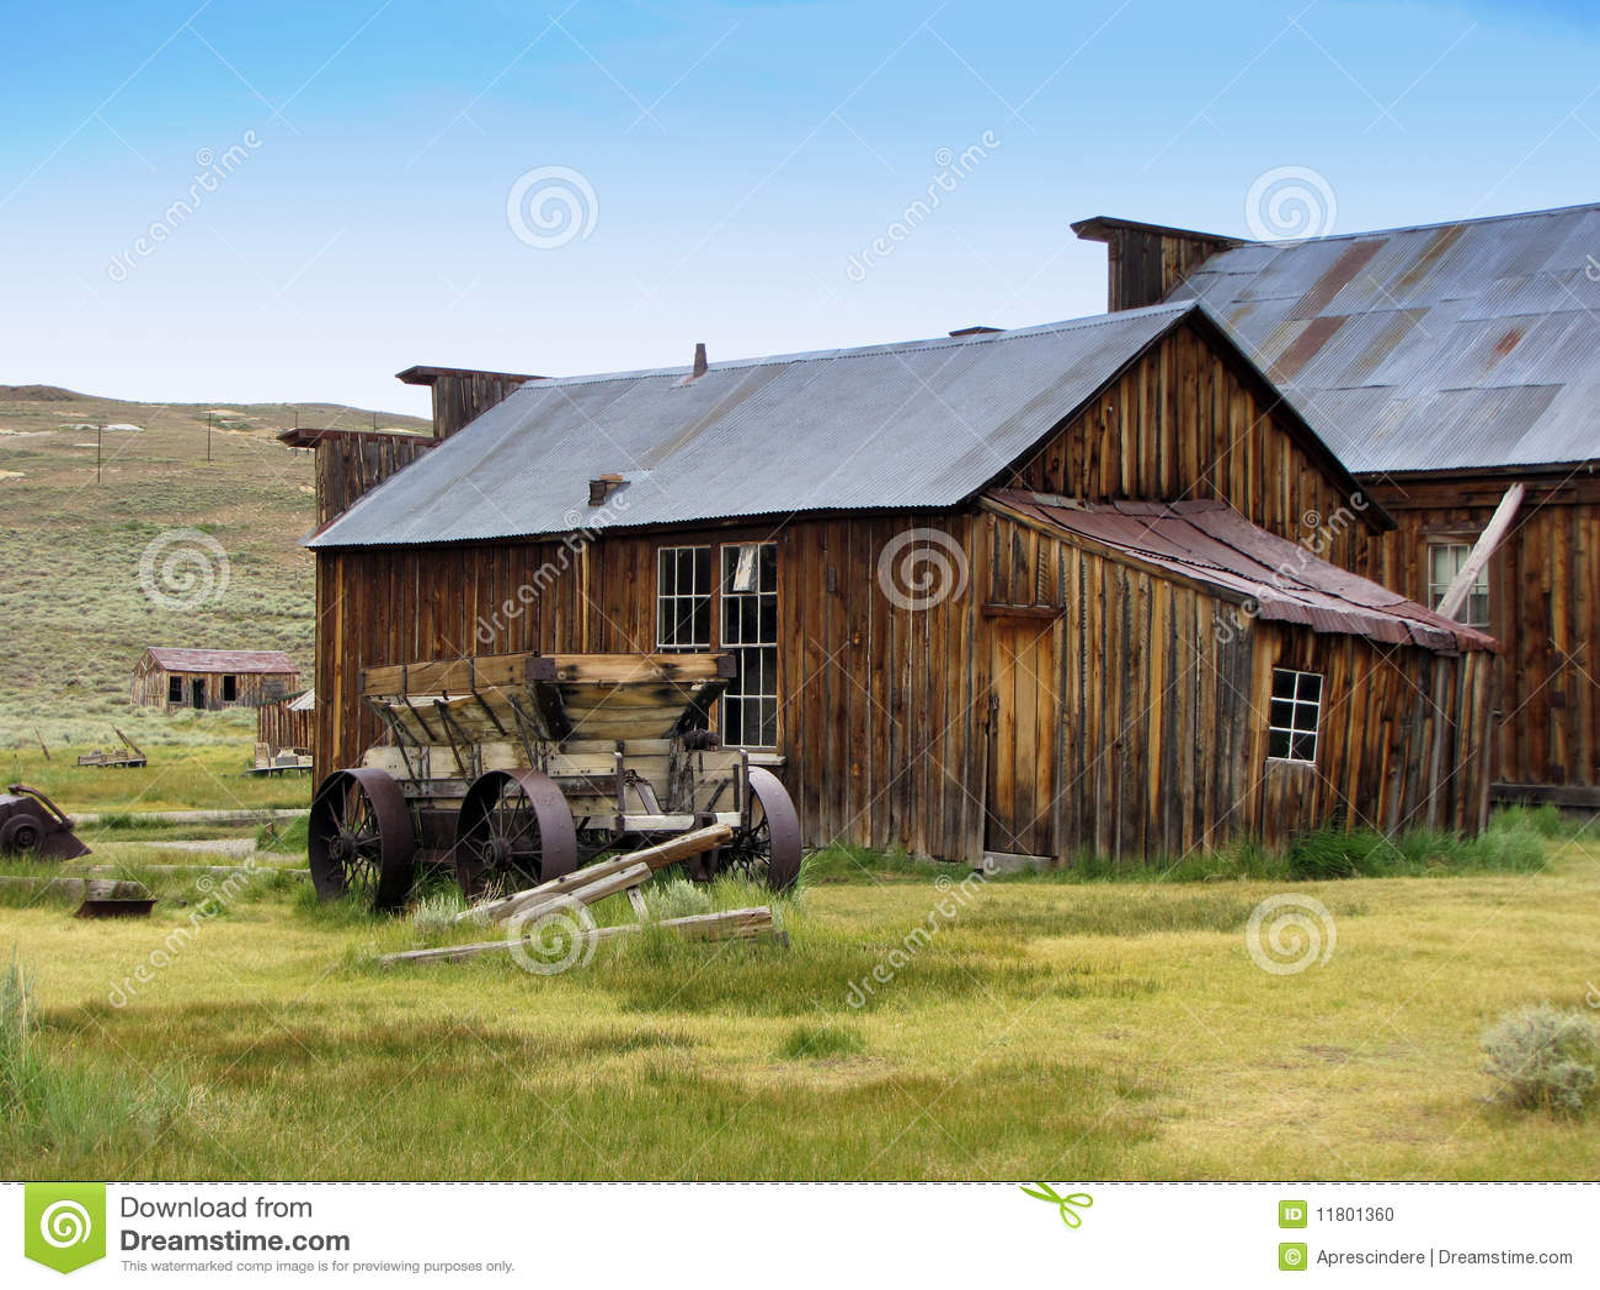 Old farm house stock photo image 11801360 for Farm house pics